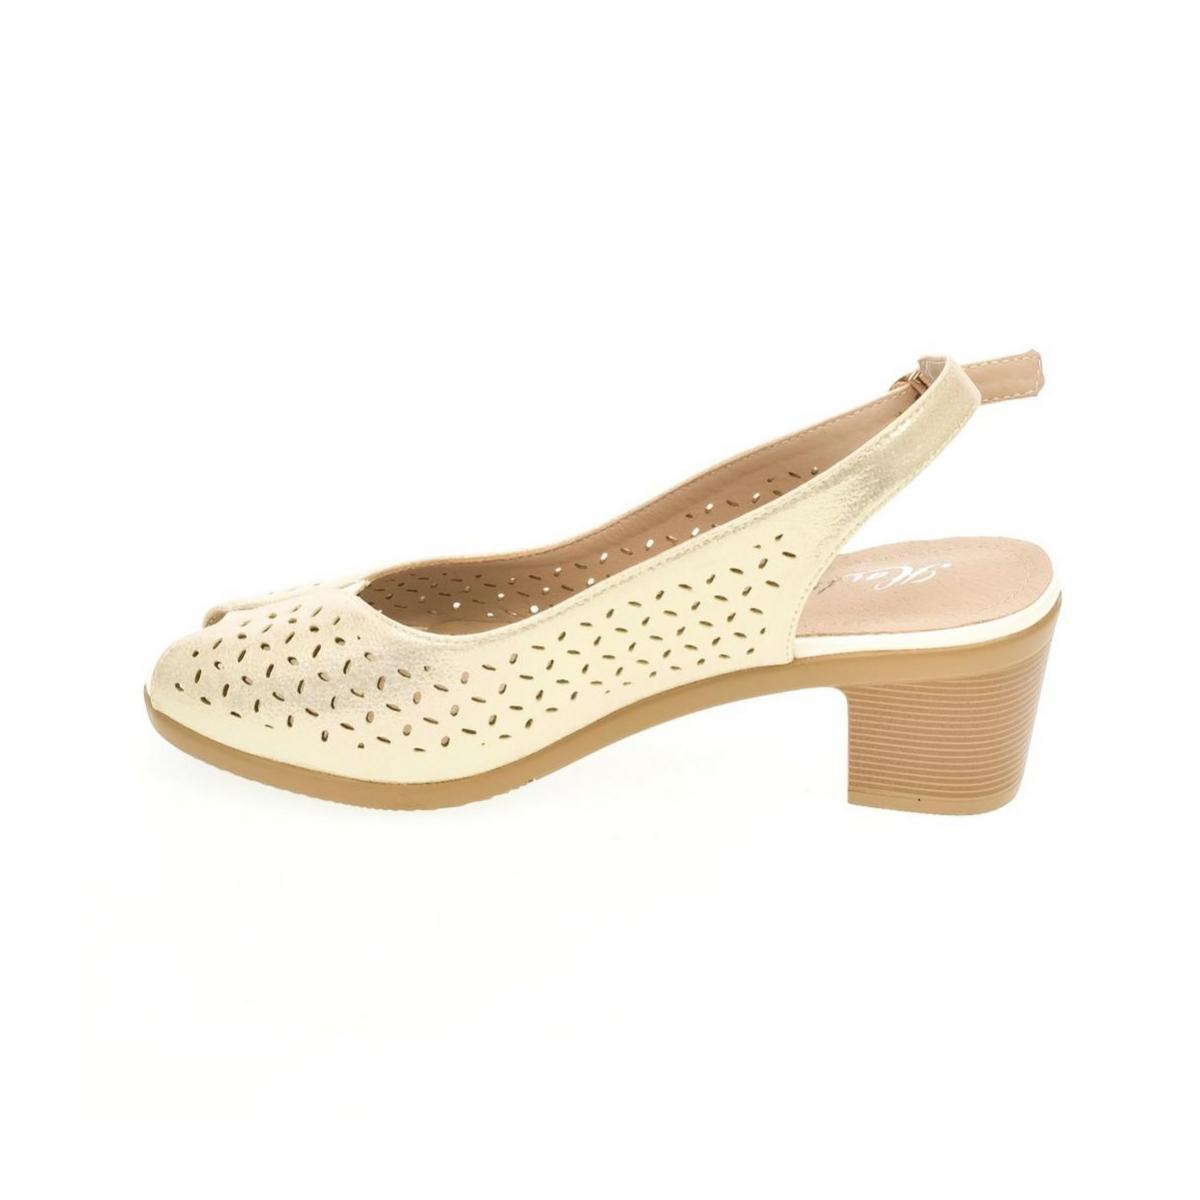 c483cac44133 Dámske biele sandále SONA - 5